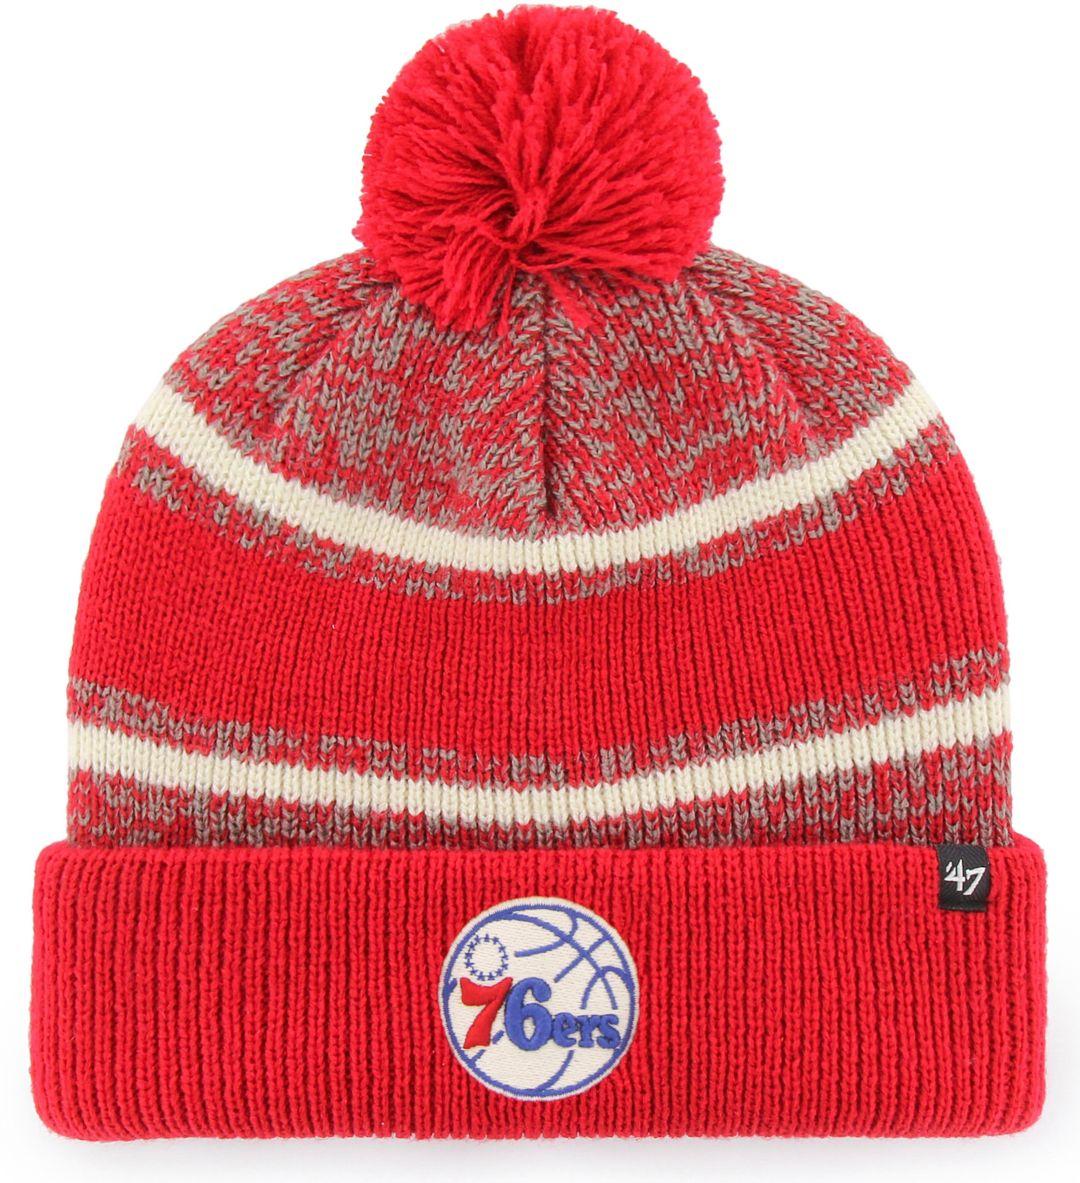 finest selection 3b773 07d65 47 Men s Philadelphia 76ers Fairfax Knit Hat   DICK S Sporting Goods